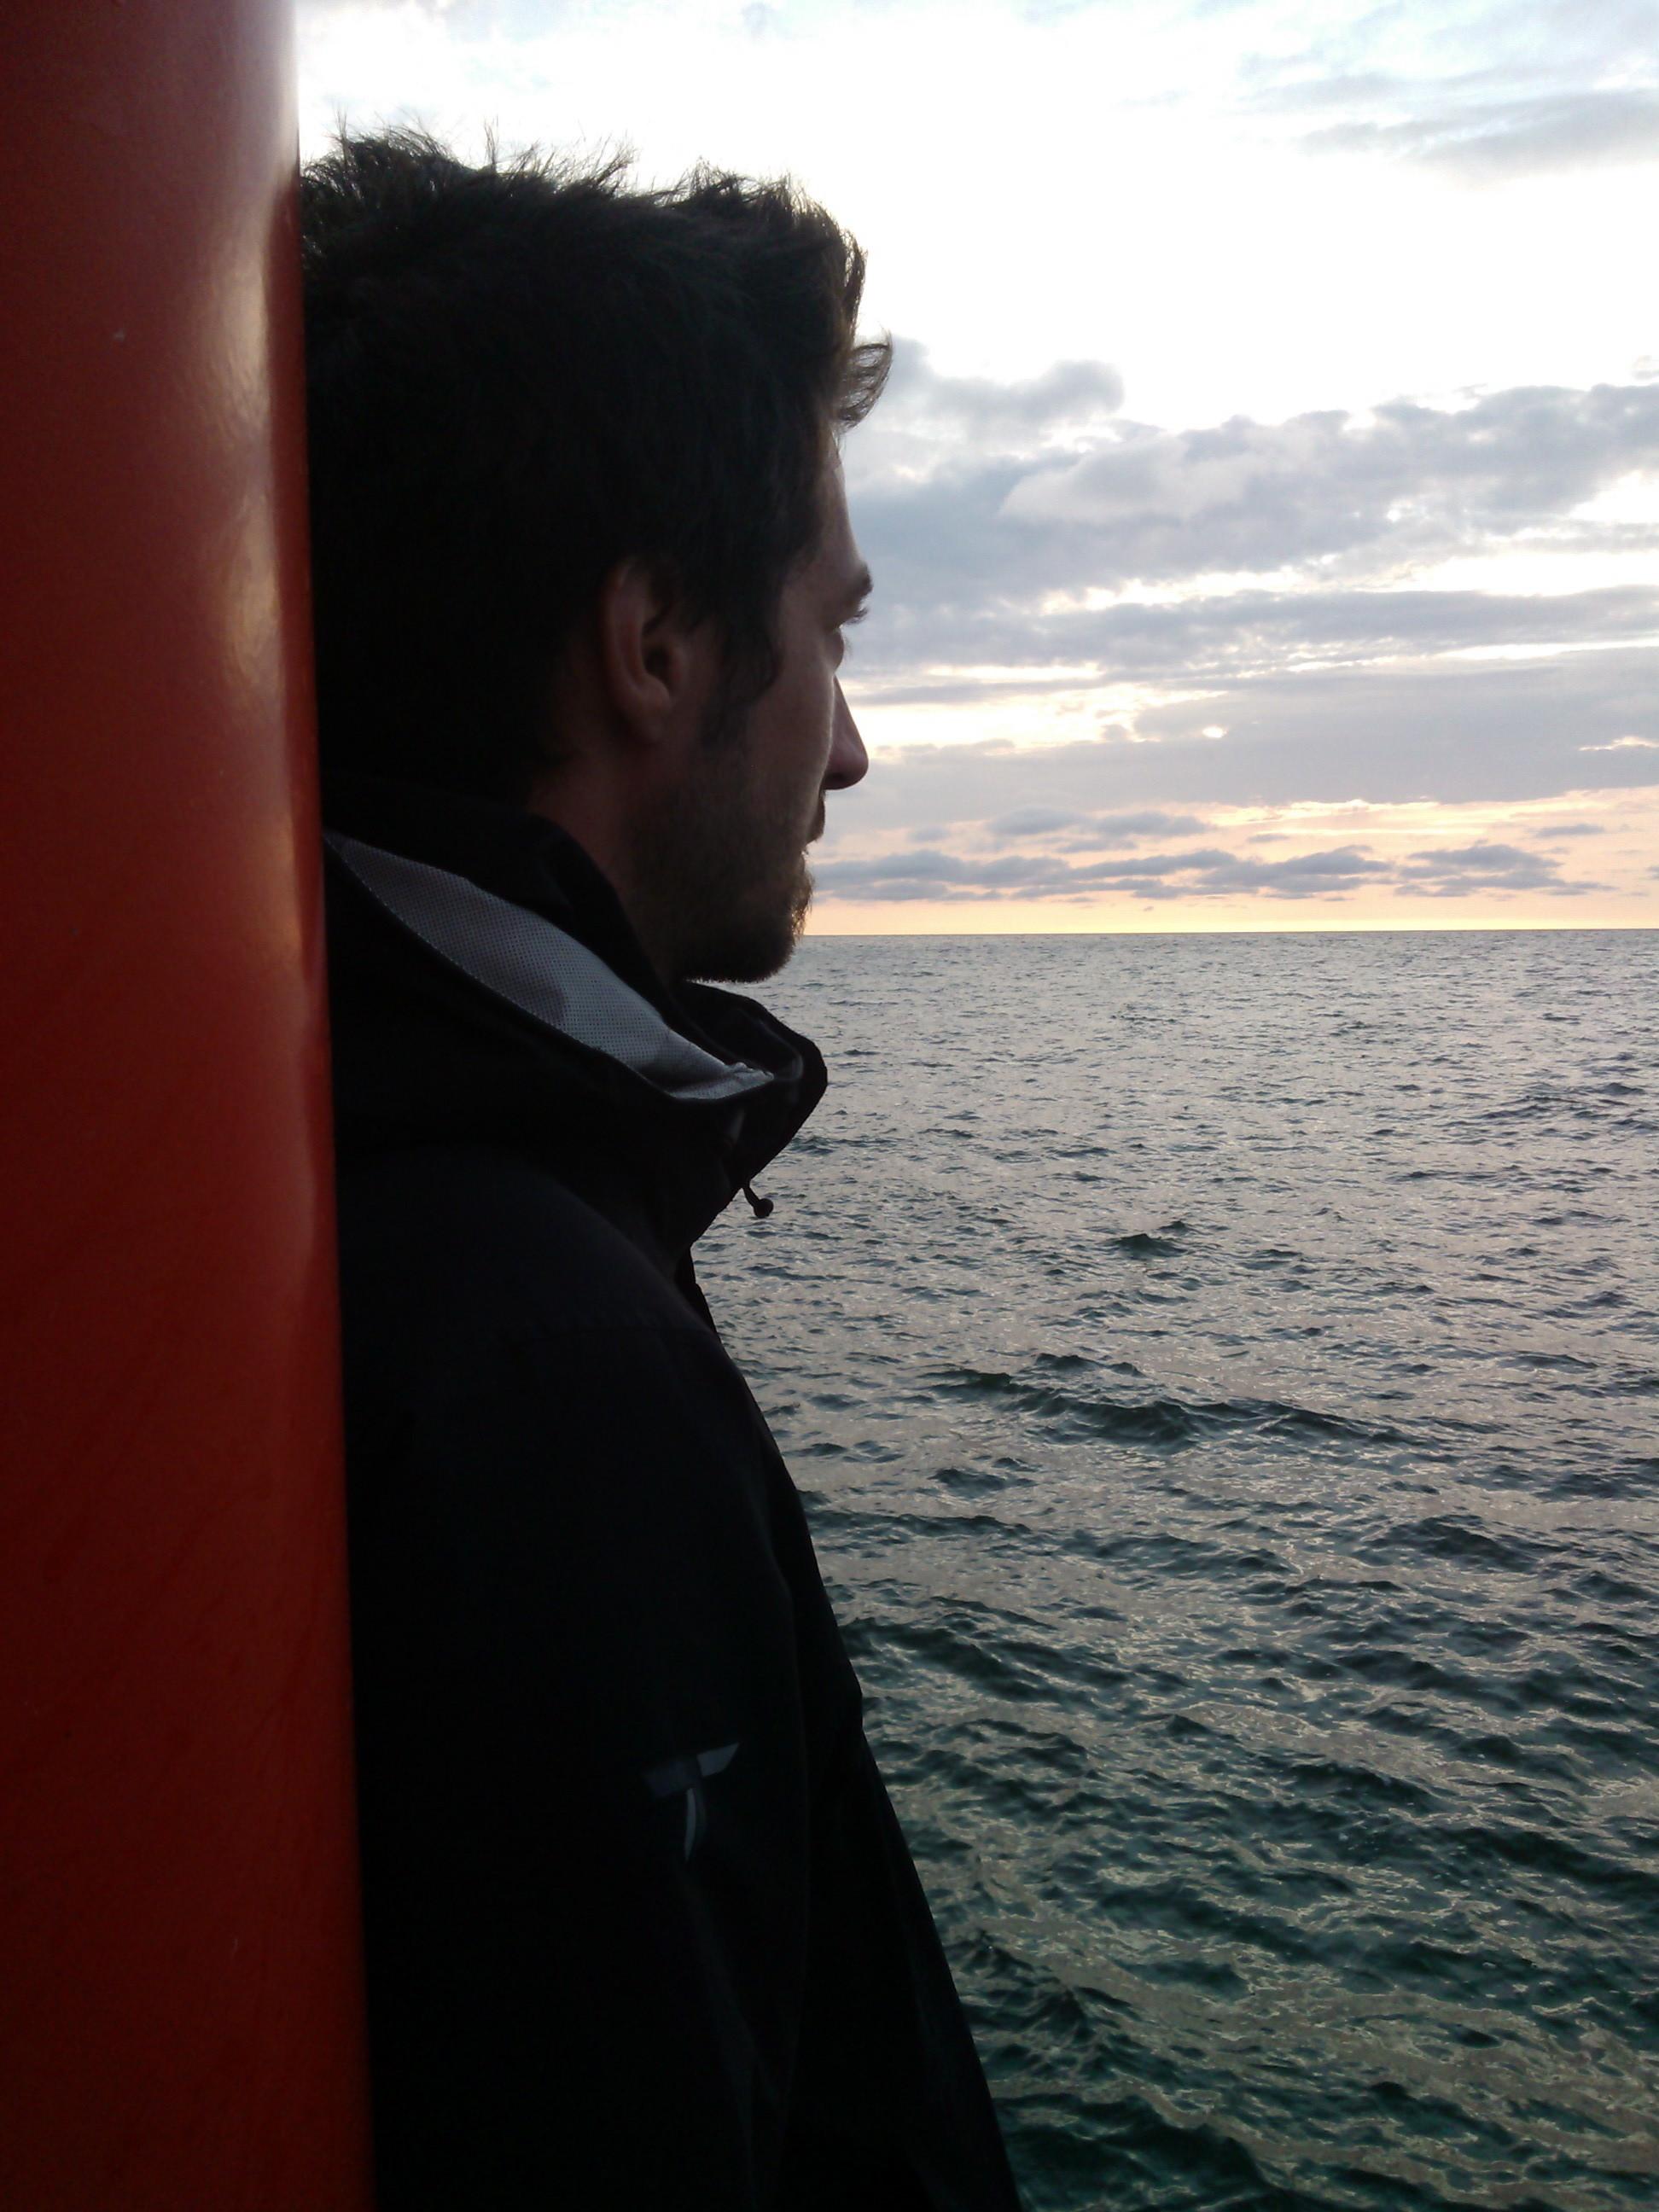 Adam by the sea.